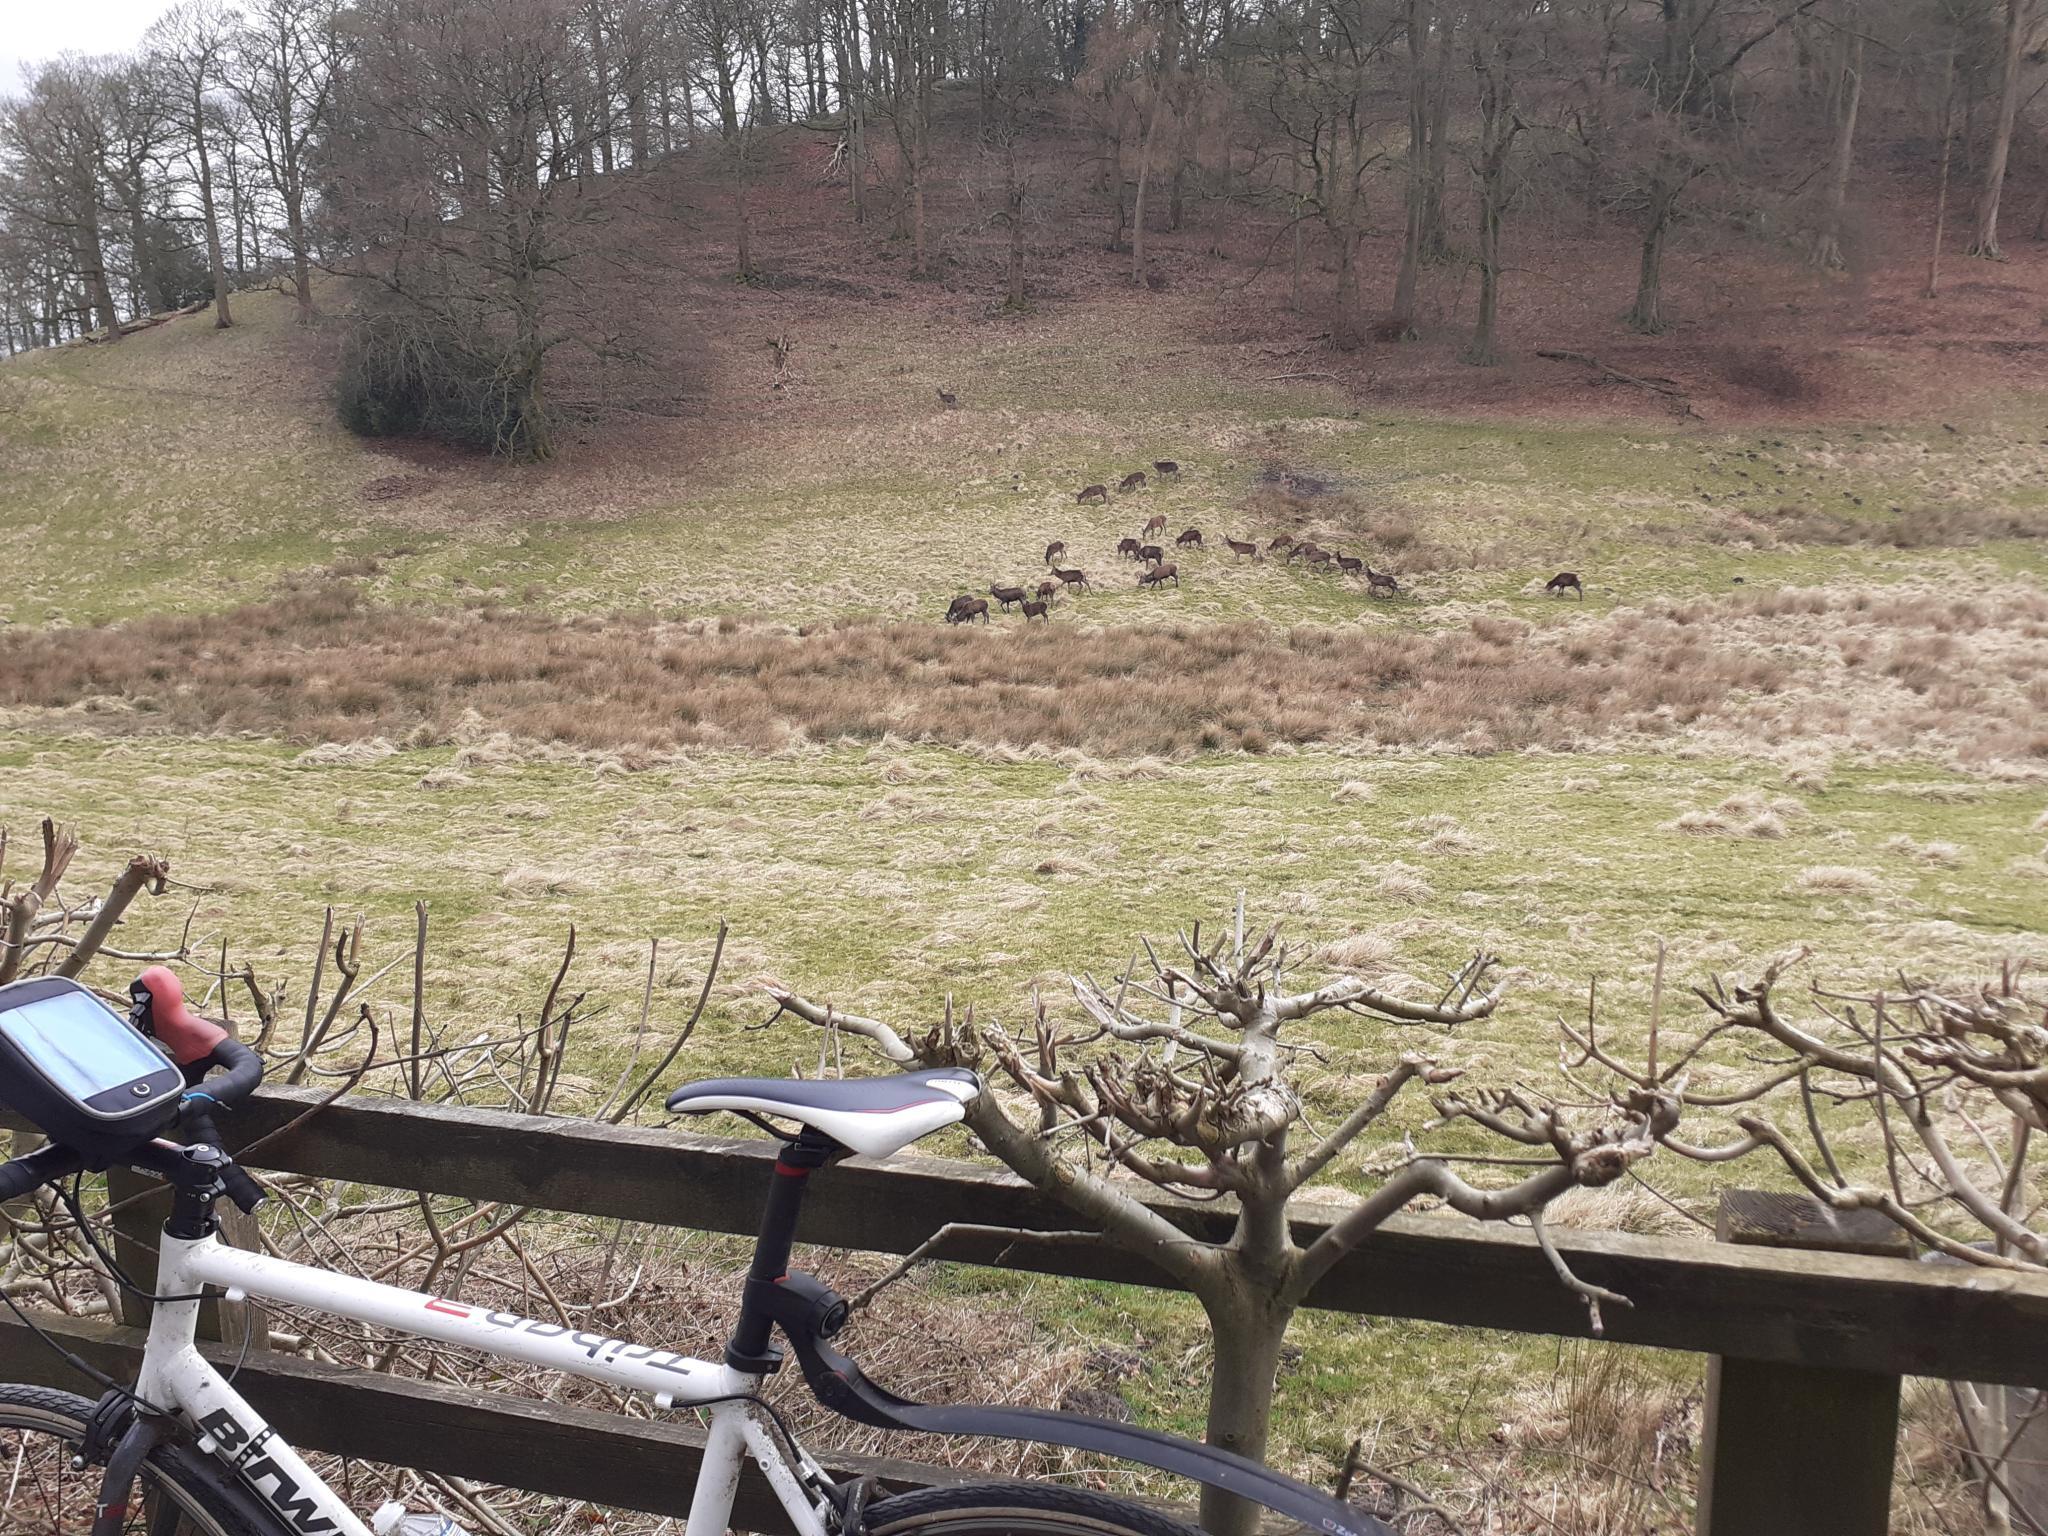 On my bike-20210309_151343-jpg